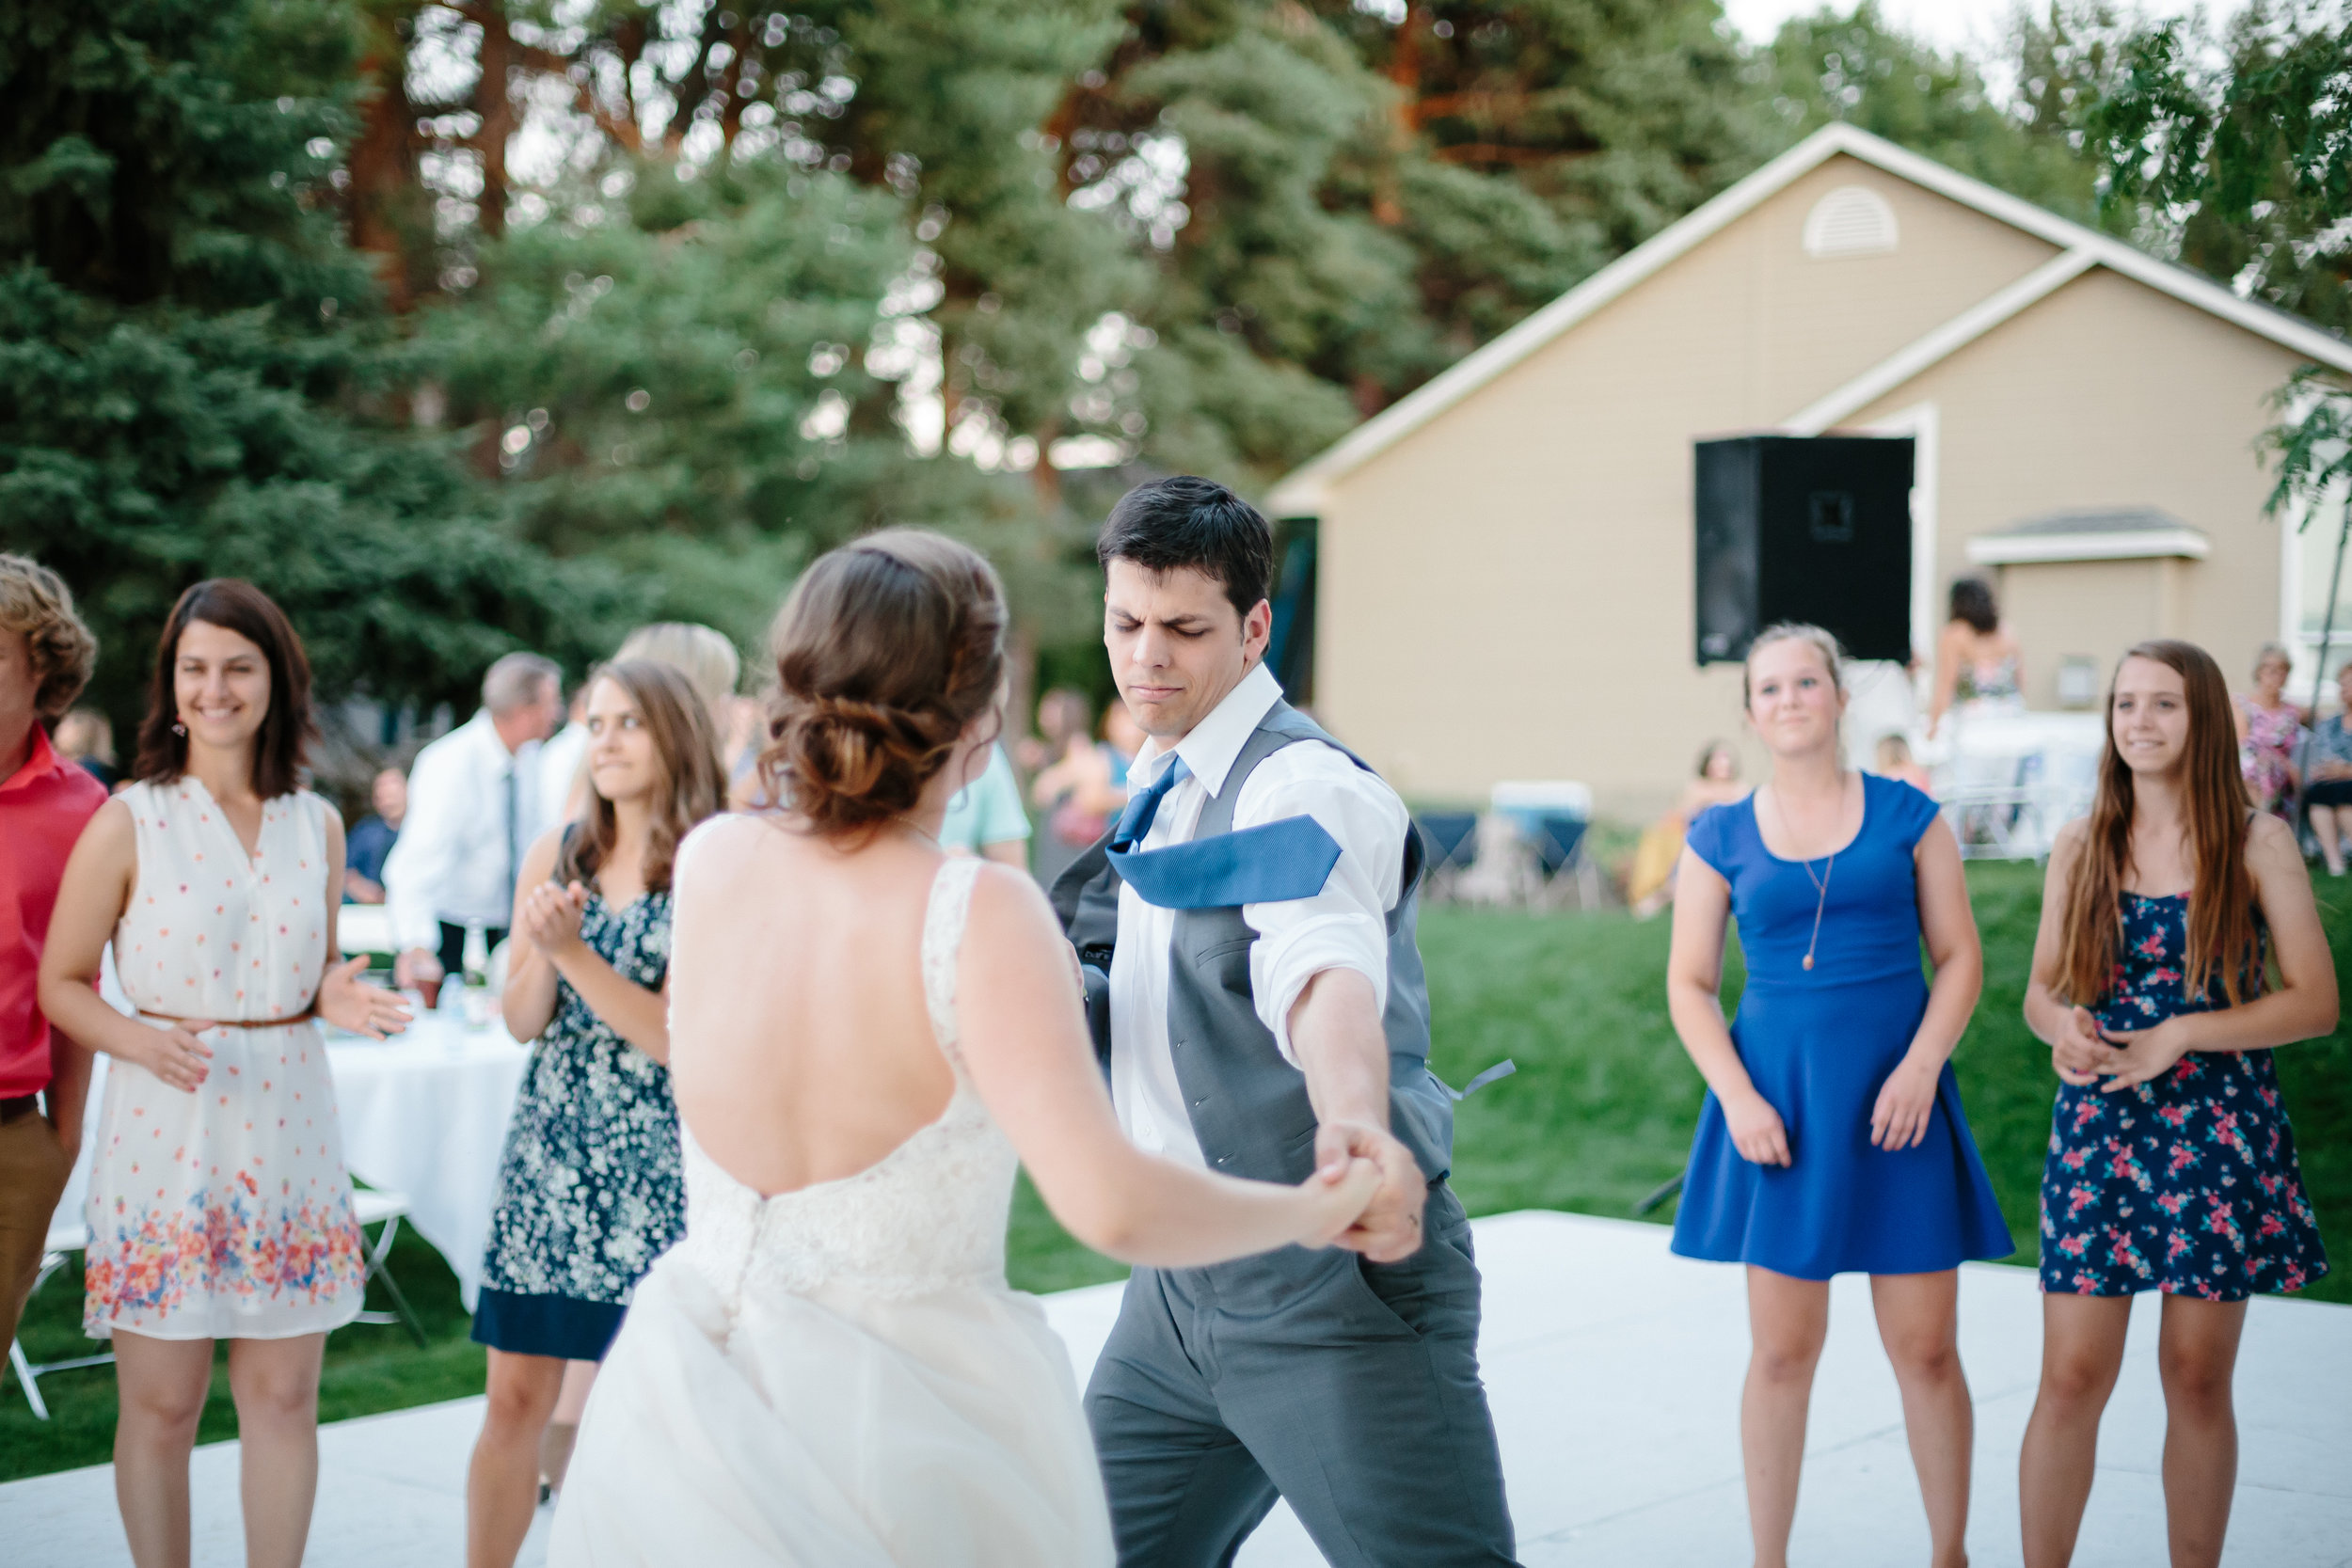 Jordan & Shantel Married - Idaho - Corrie Mick Photography-354.jpg